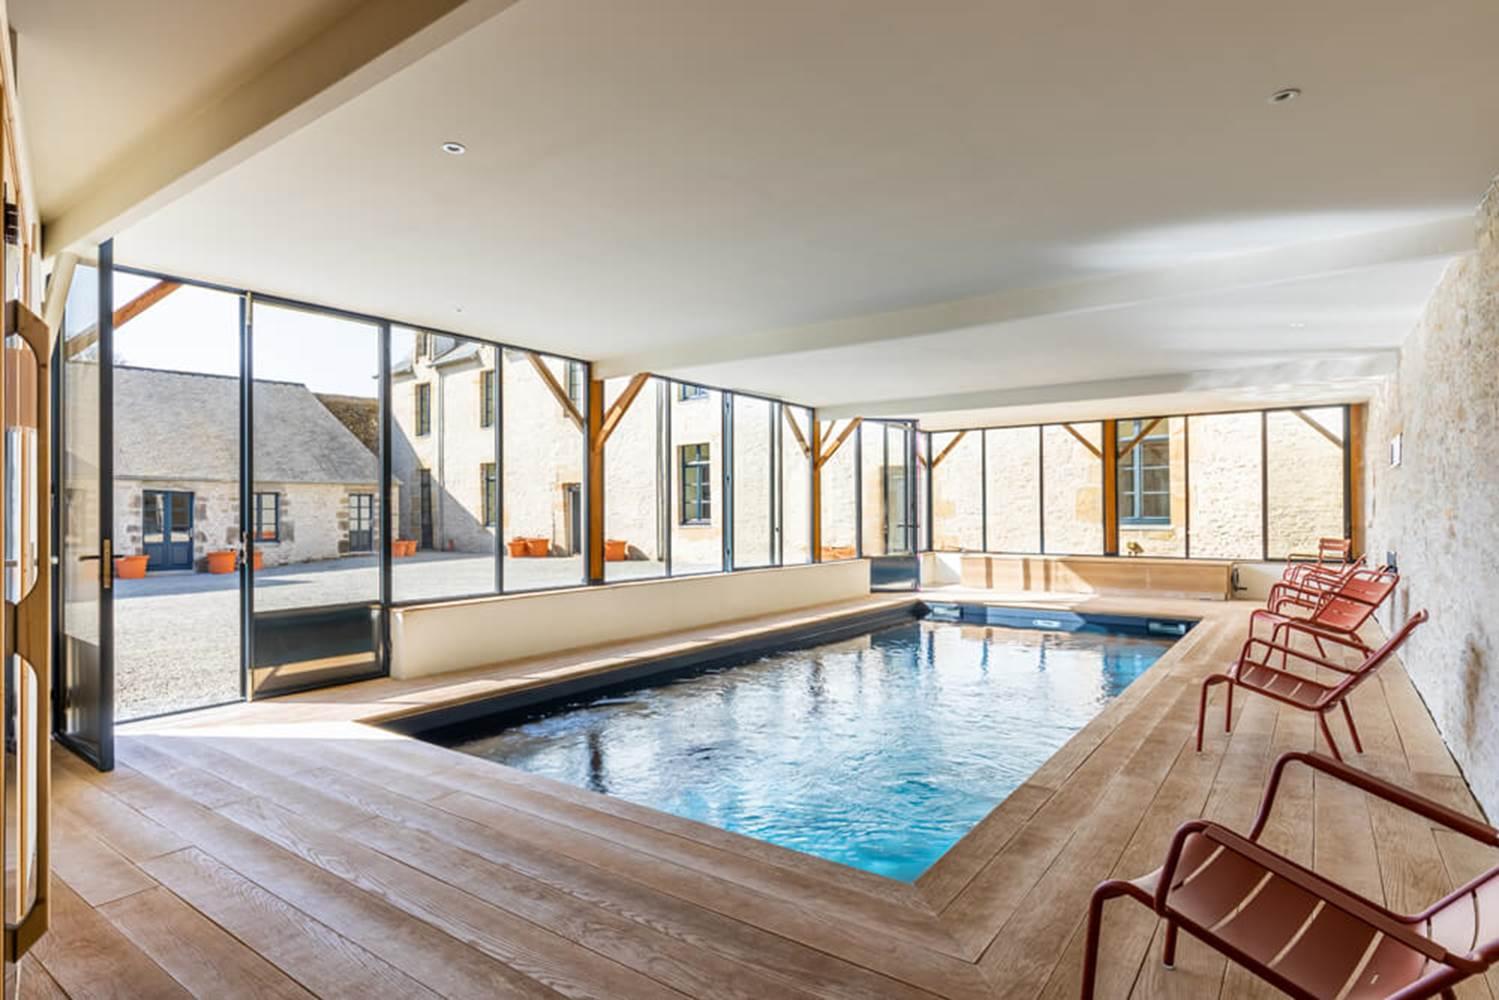 piscine-interieure-sauna-manoir-du-guern-pluvigner ©